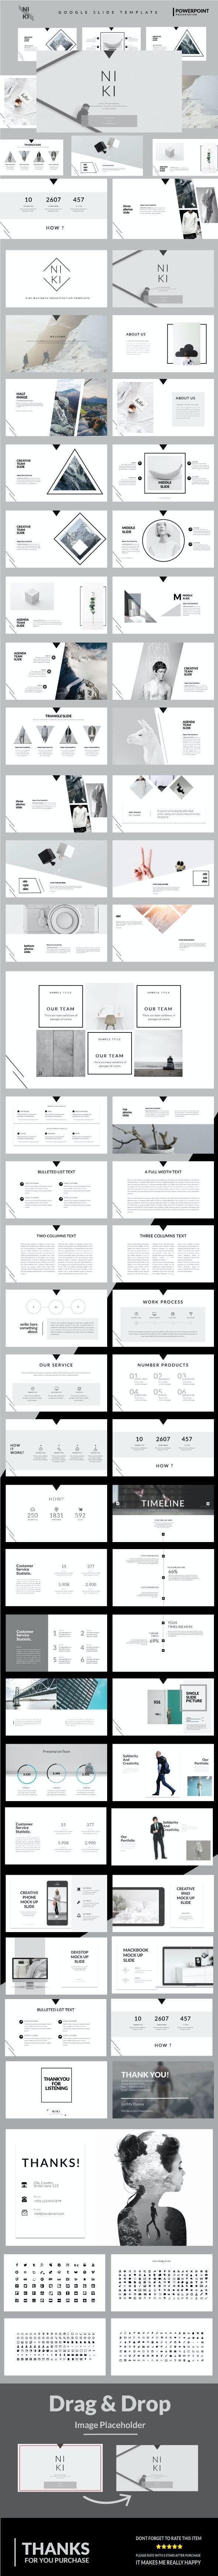 Niki - Google Slide Template - Google Slides Presentation Templates